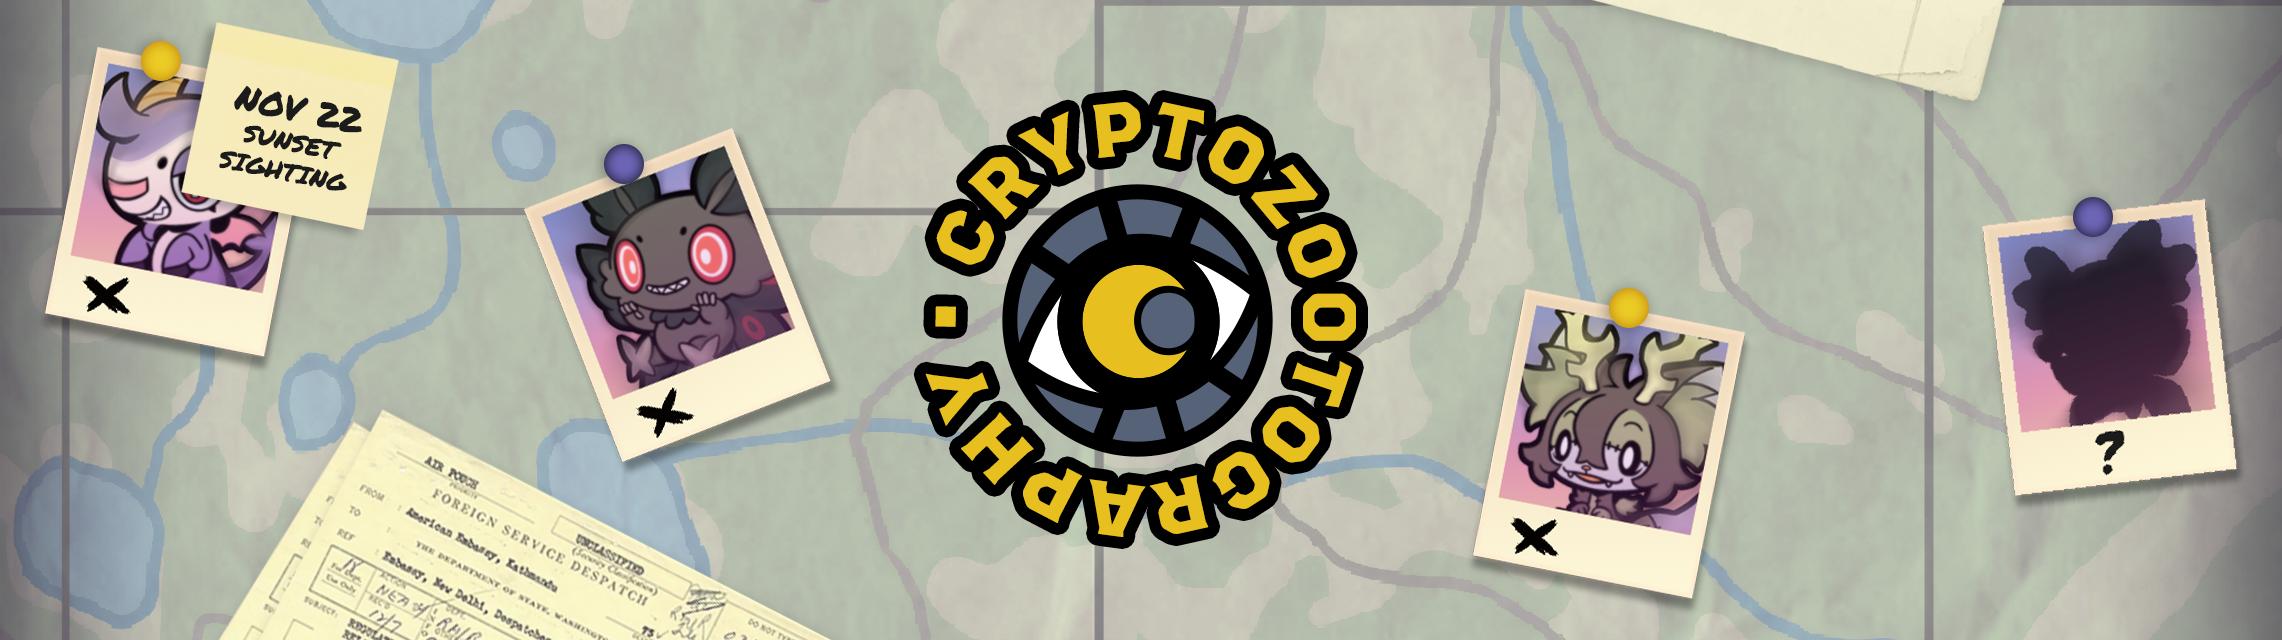 Cryptozootography